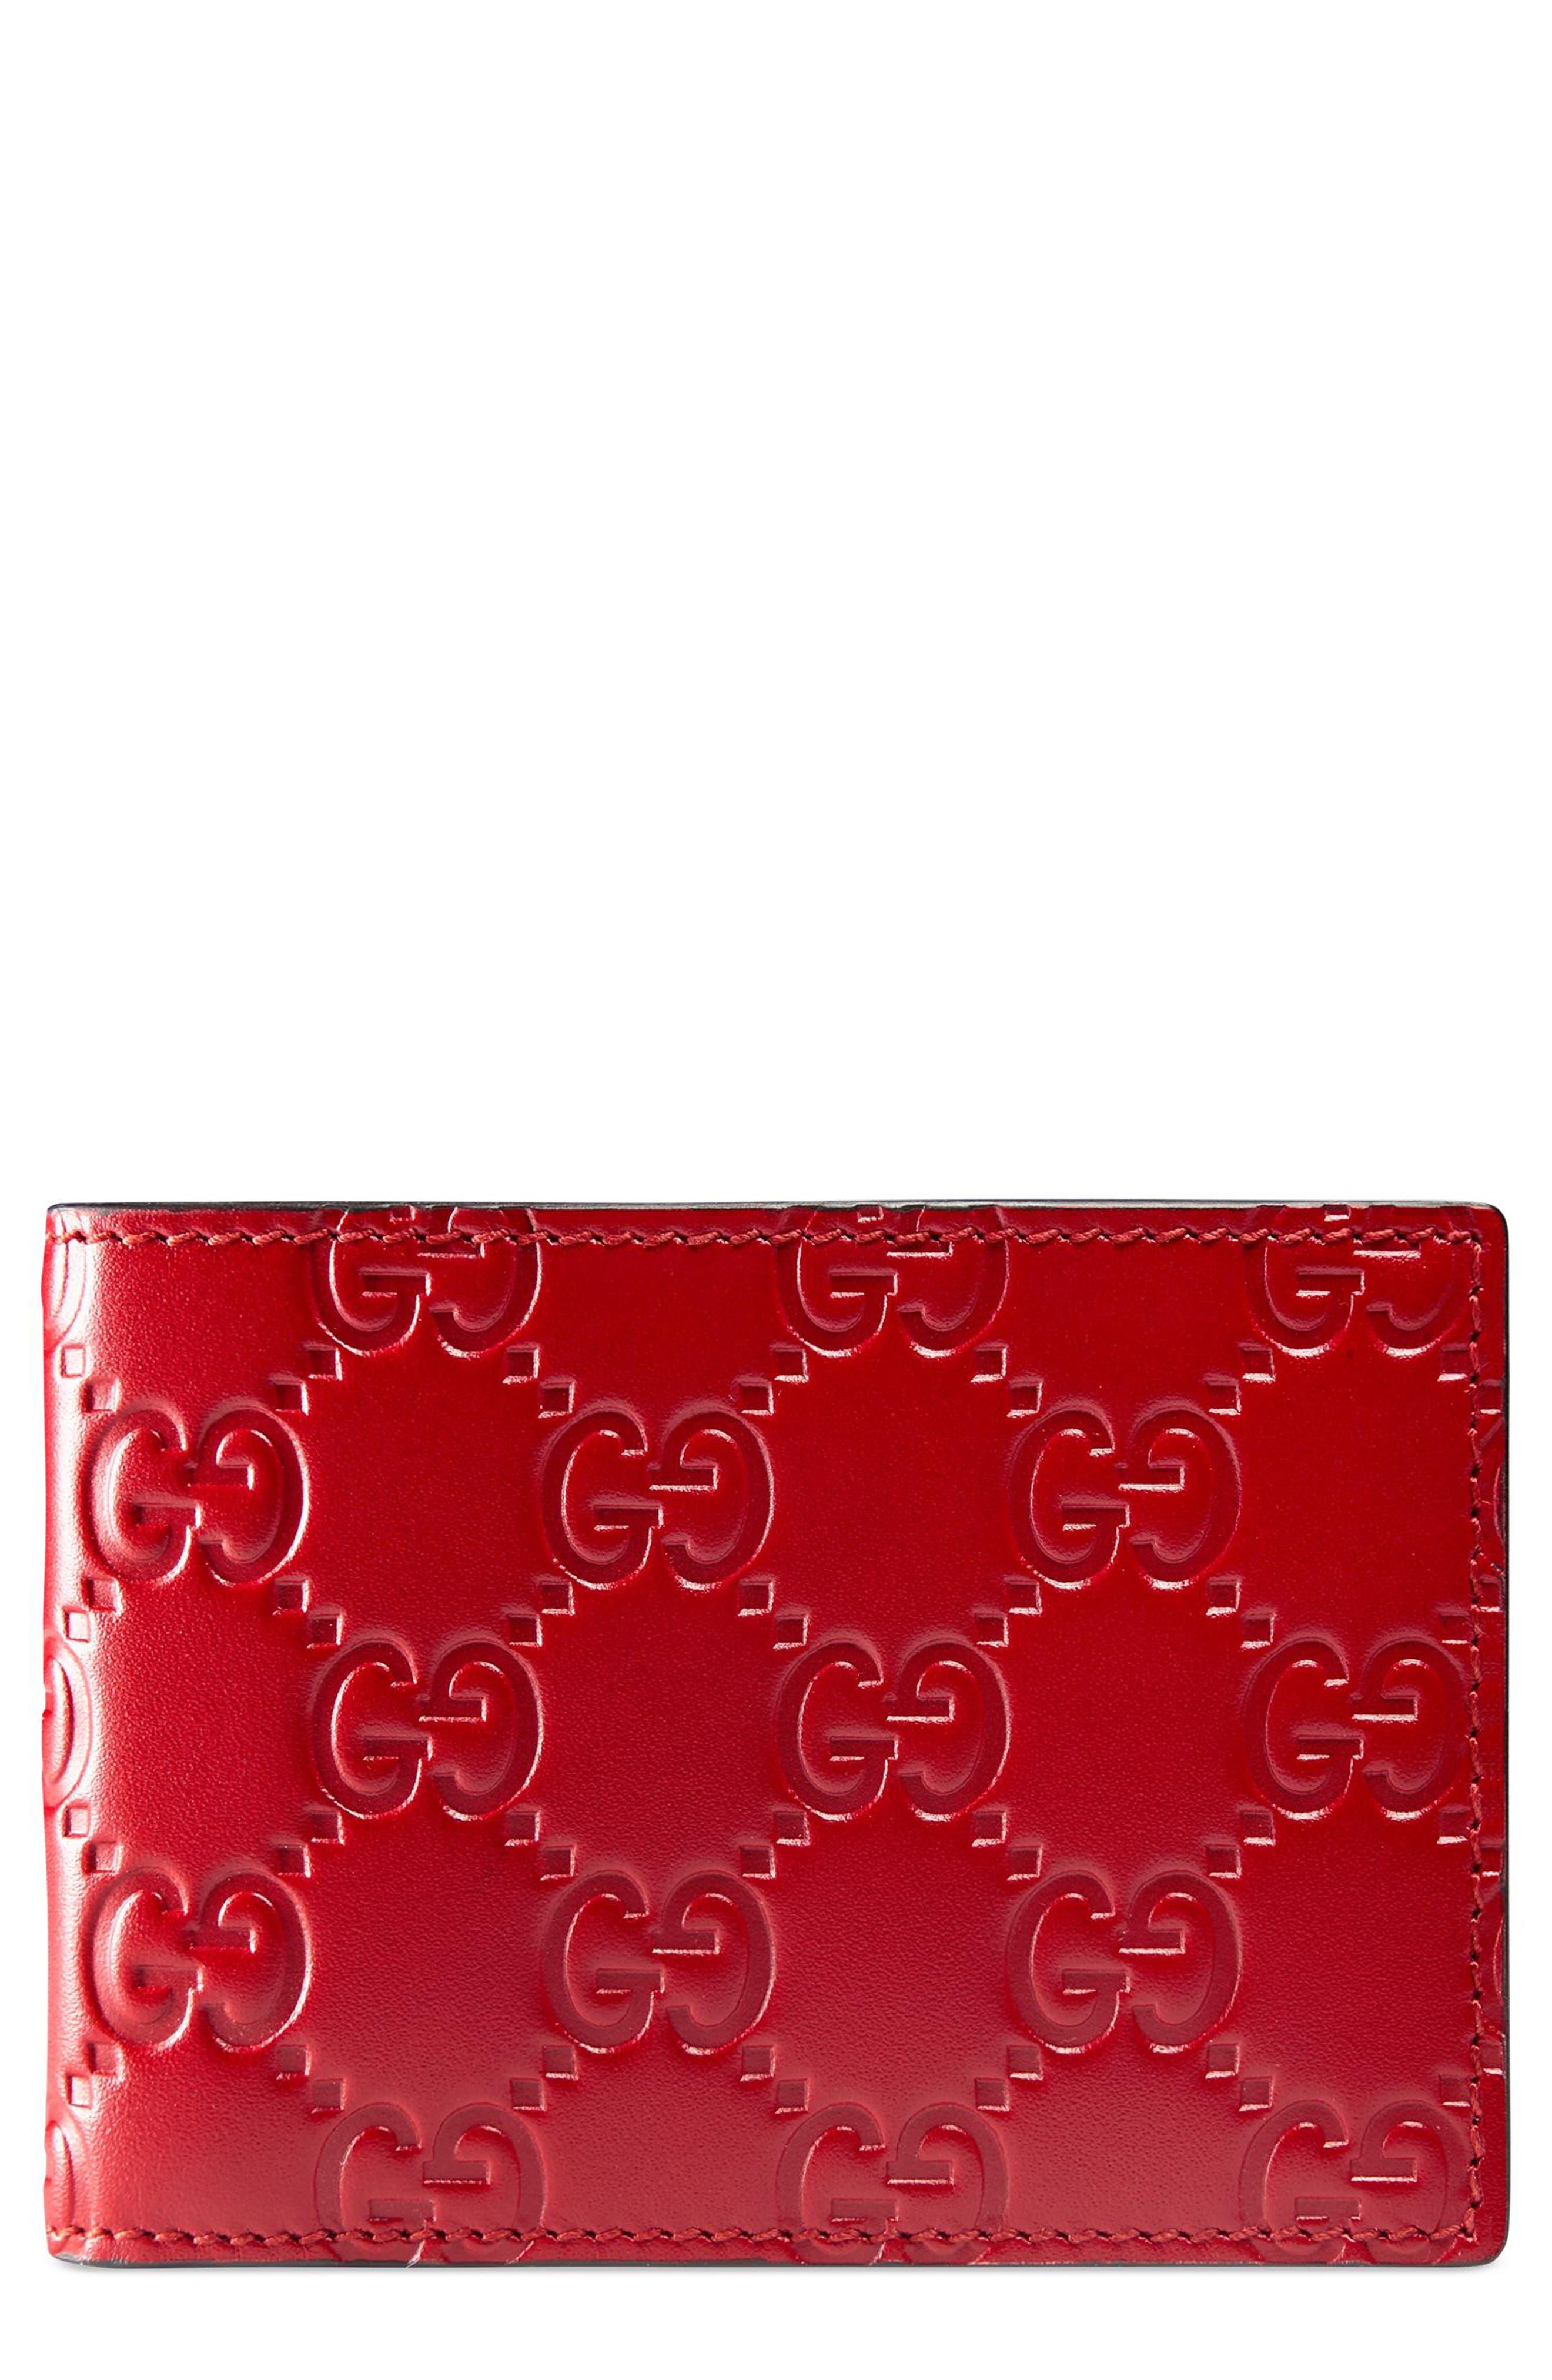 Avel Wallet,                             Main thumbnail 1, color,                             Red